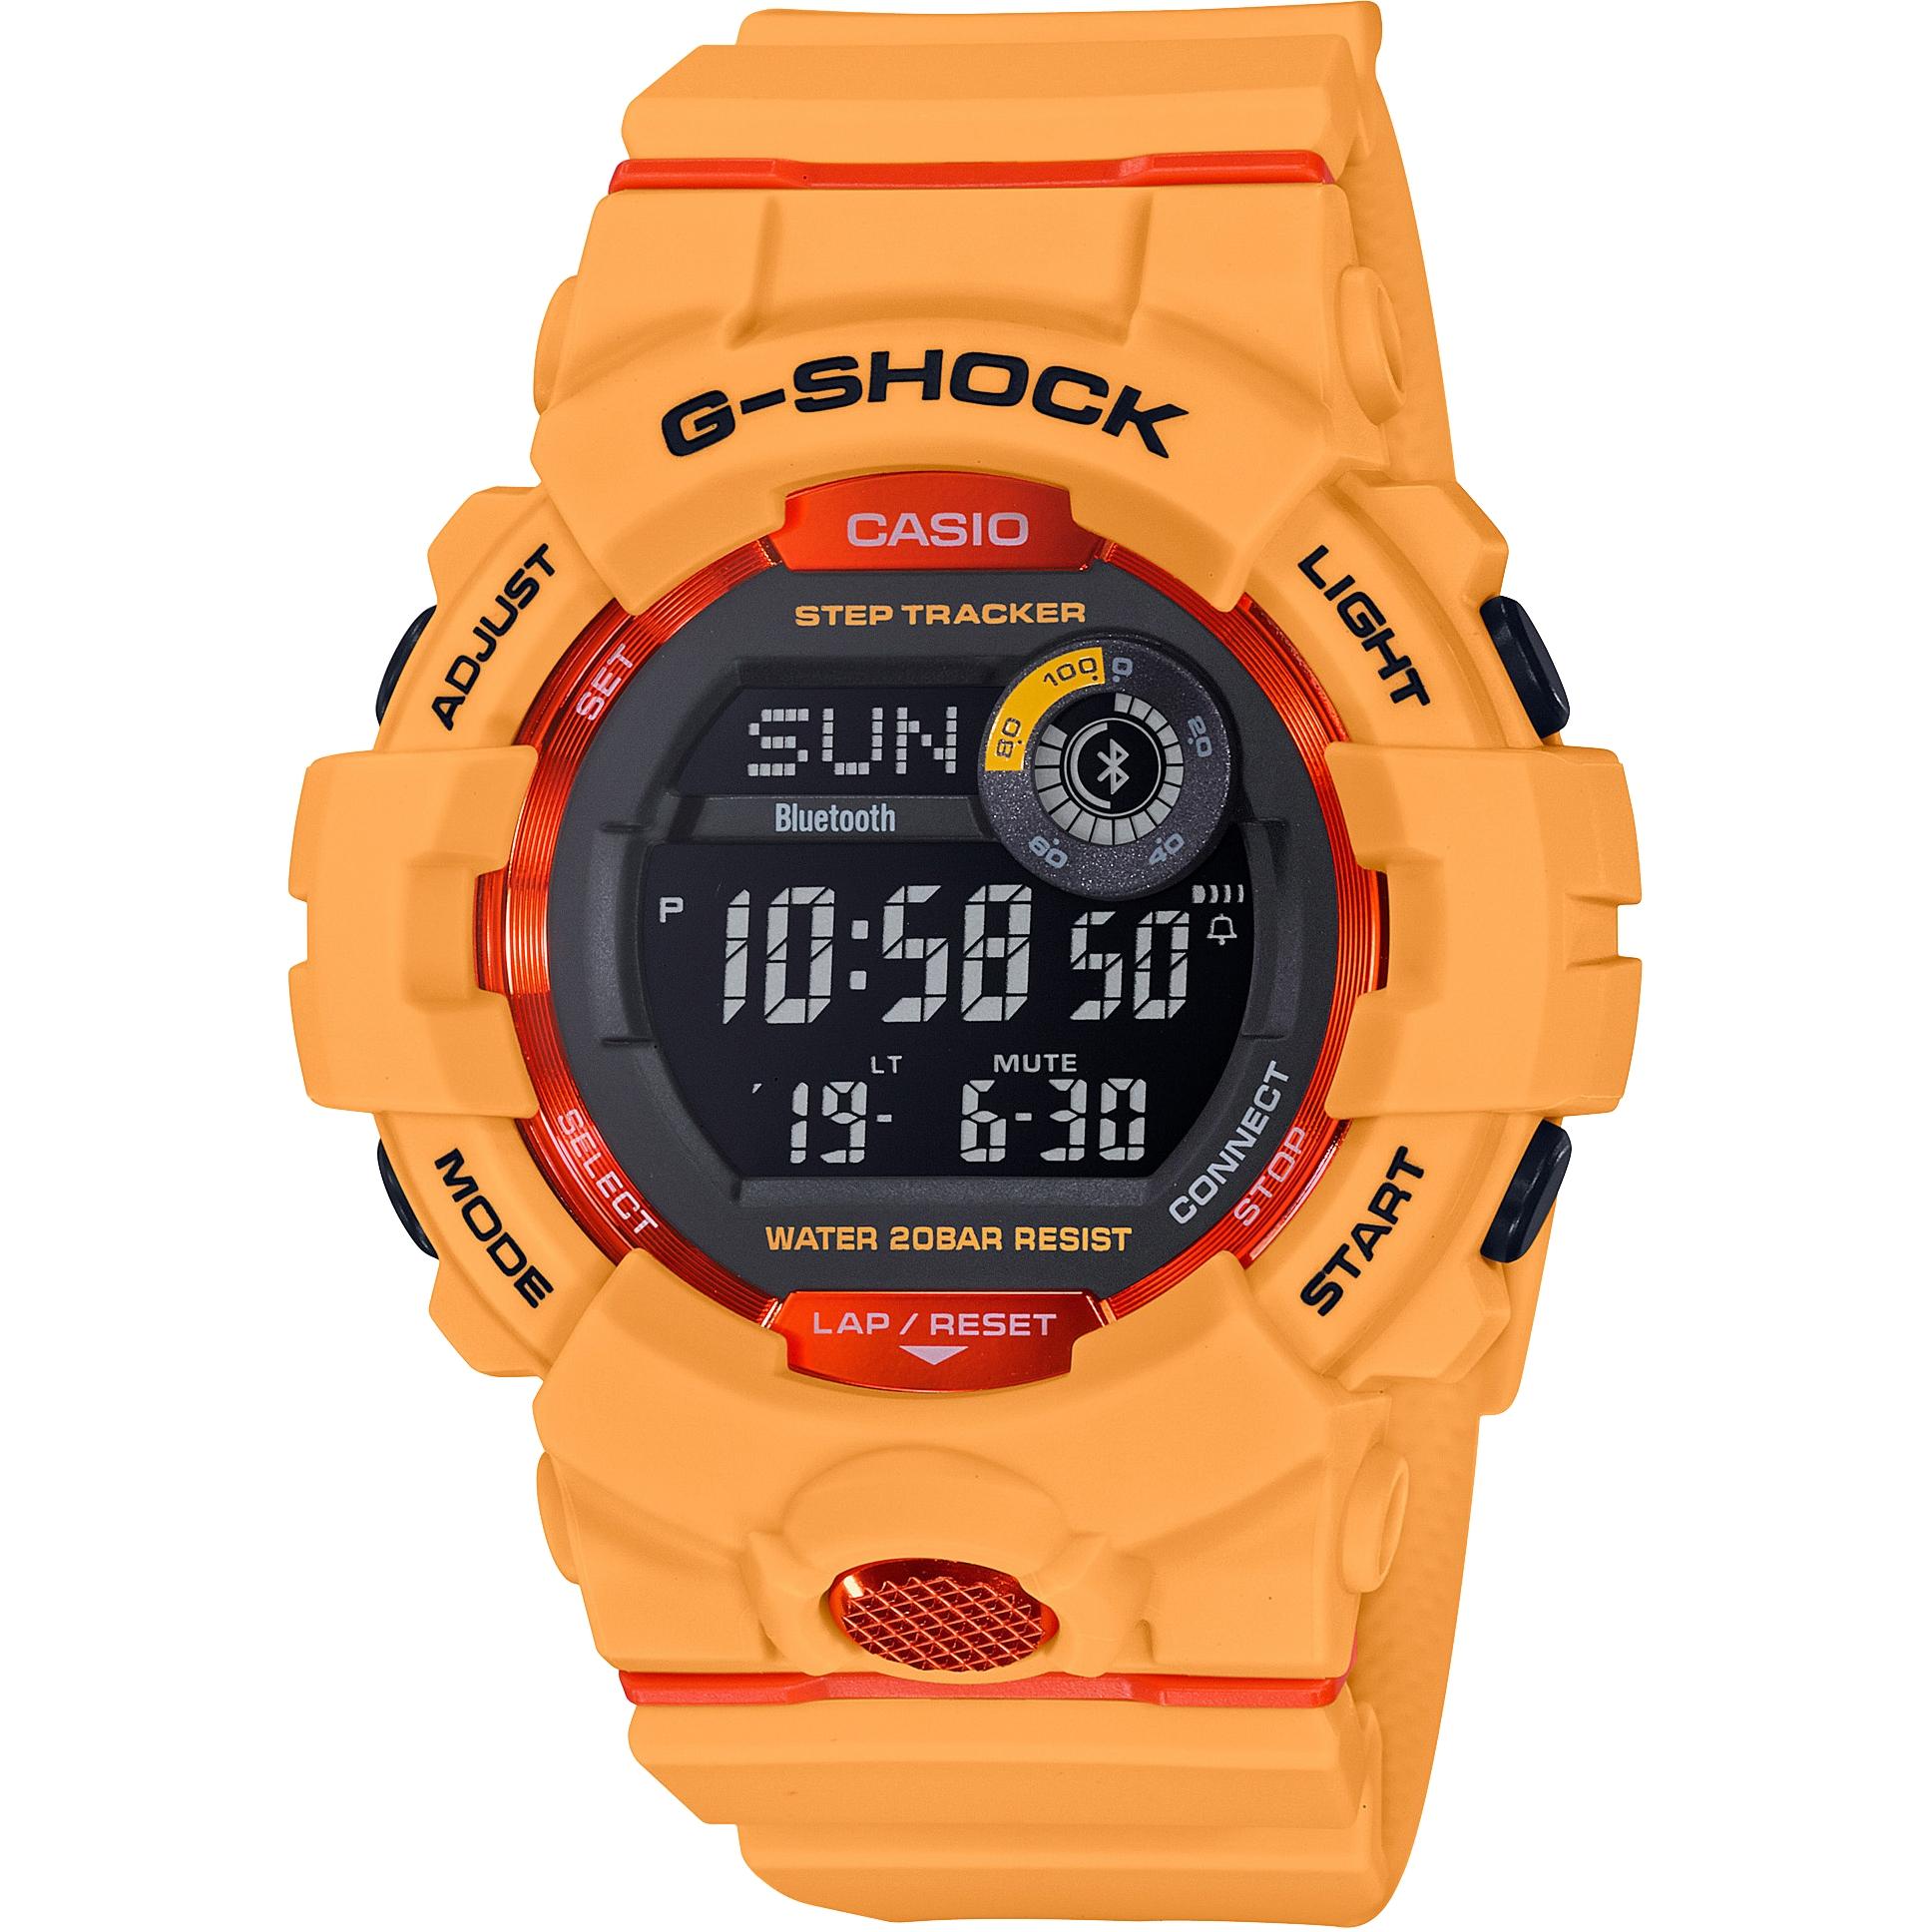 0829fd25d Casio G-Shock G-Squad Bluetooth Step Tracker Watch (GBD-800-4ER) |  WatchShop.com™